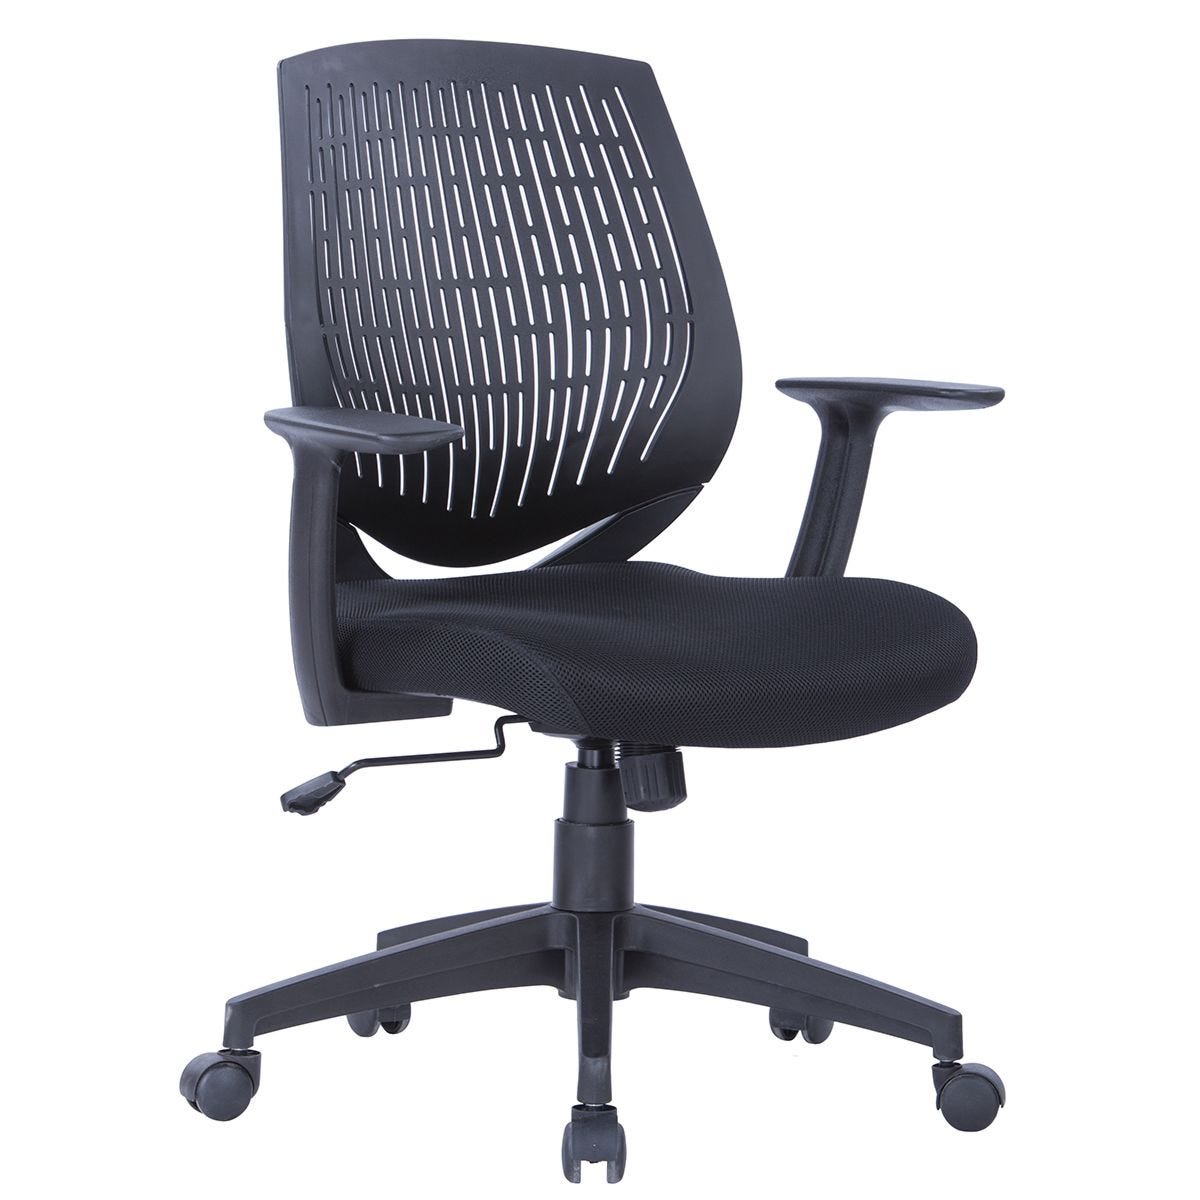 Alphason Malibu Chair - Black